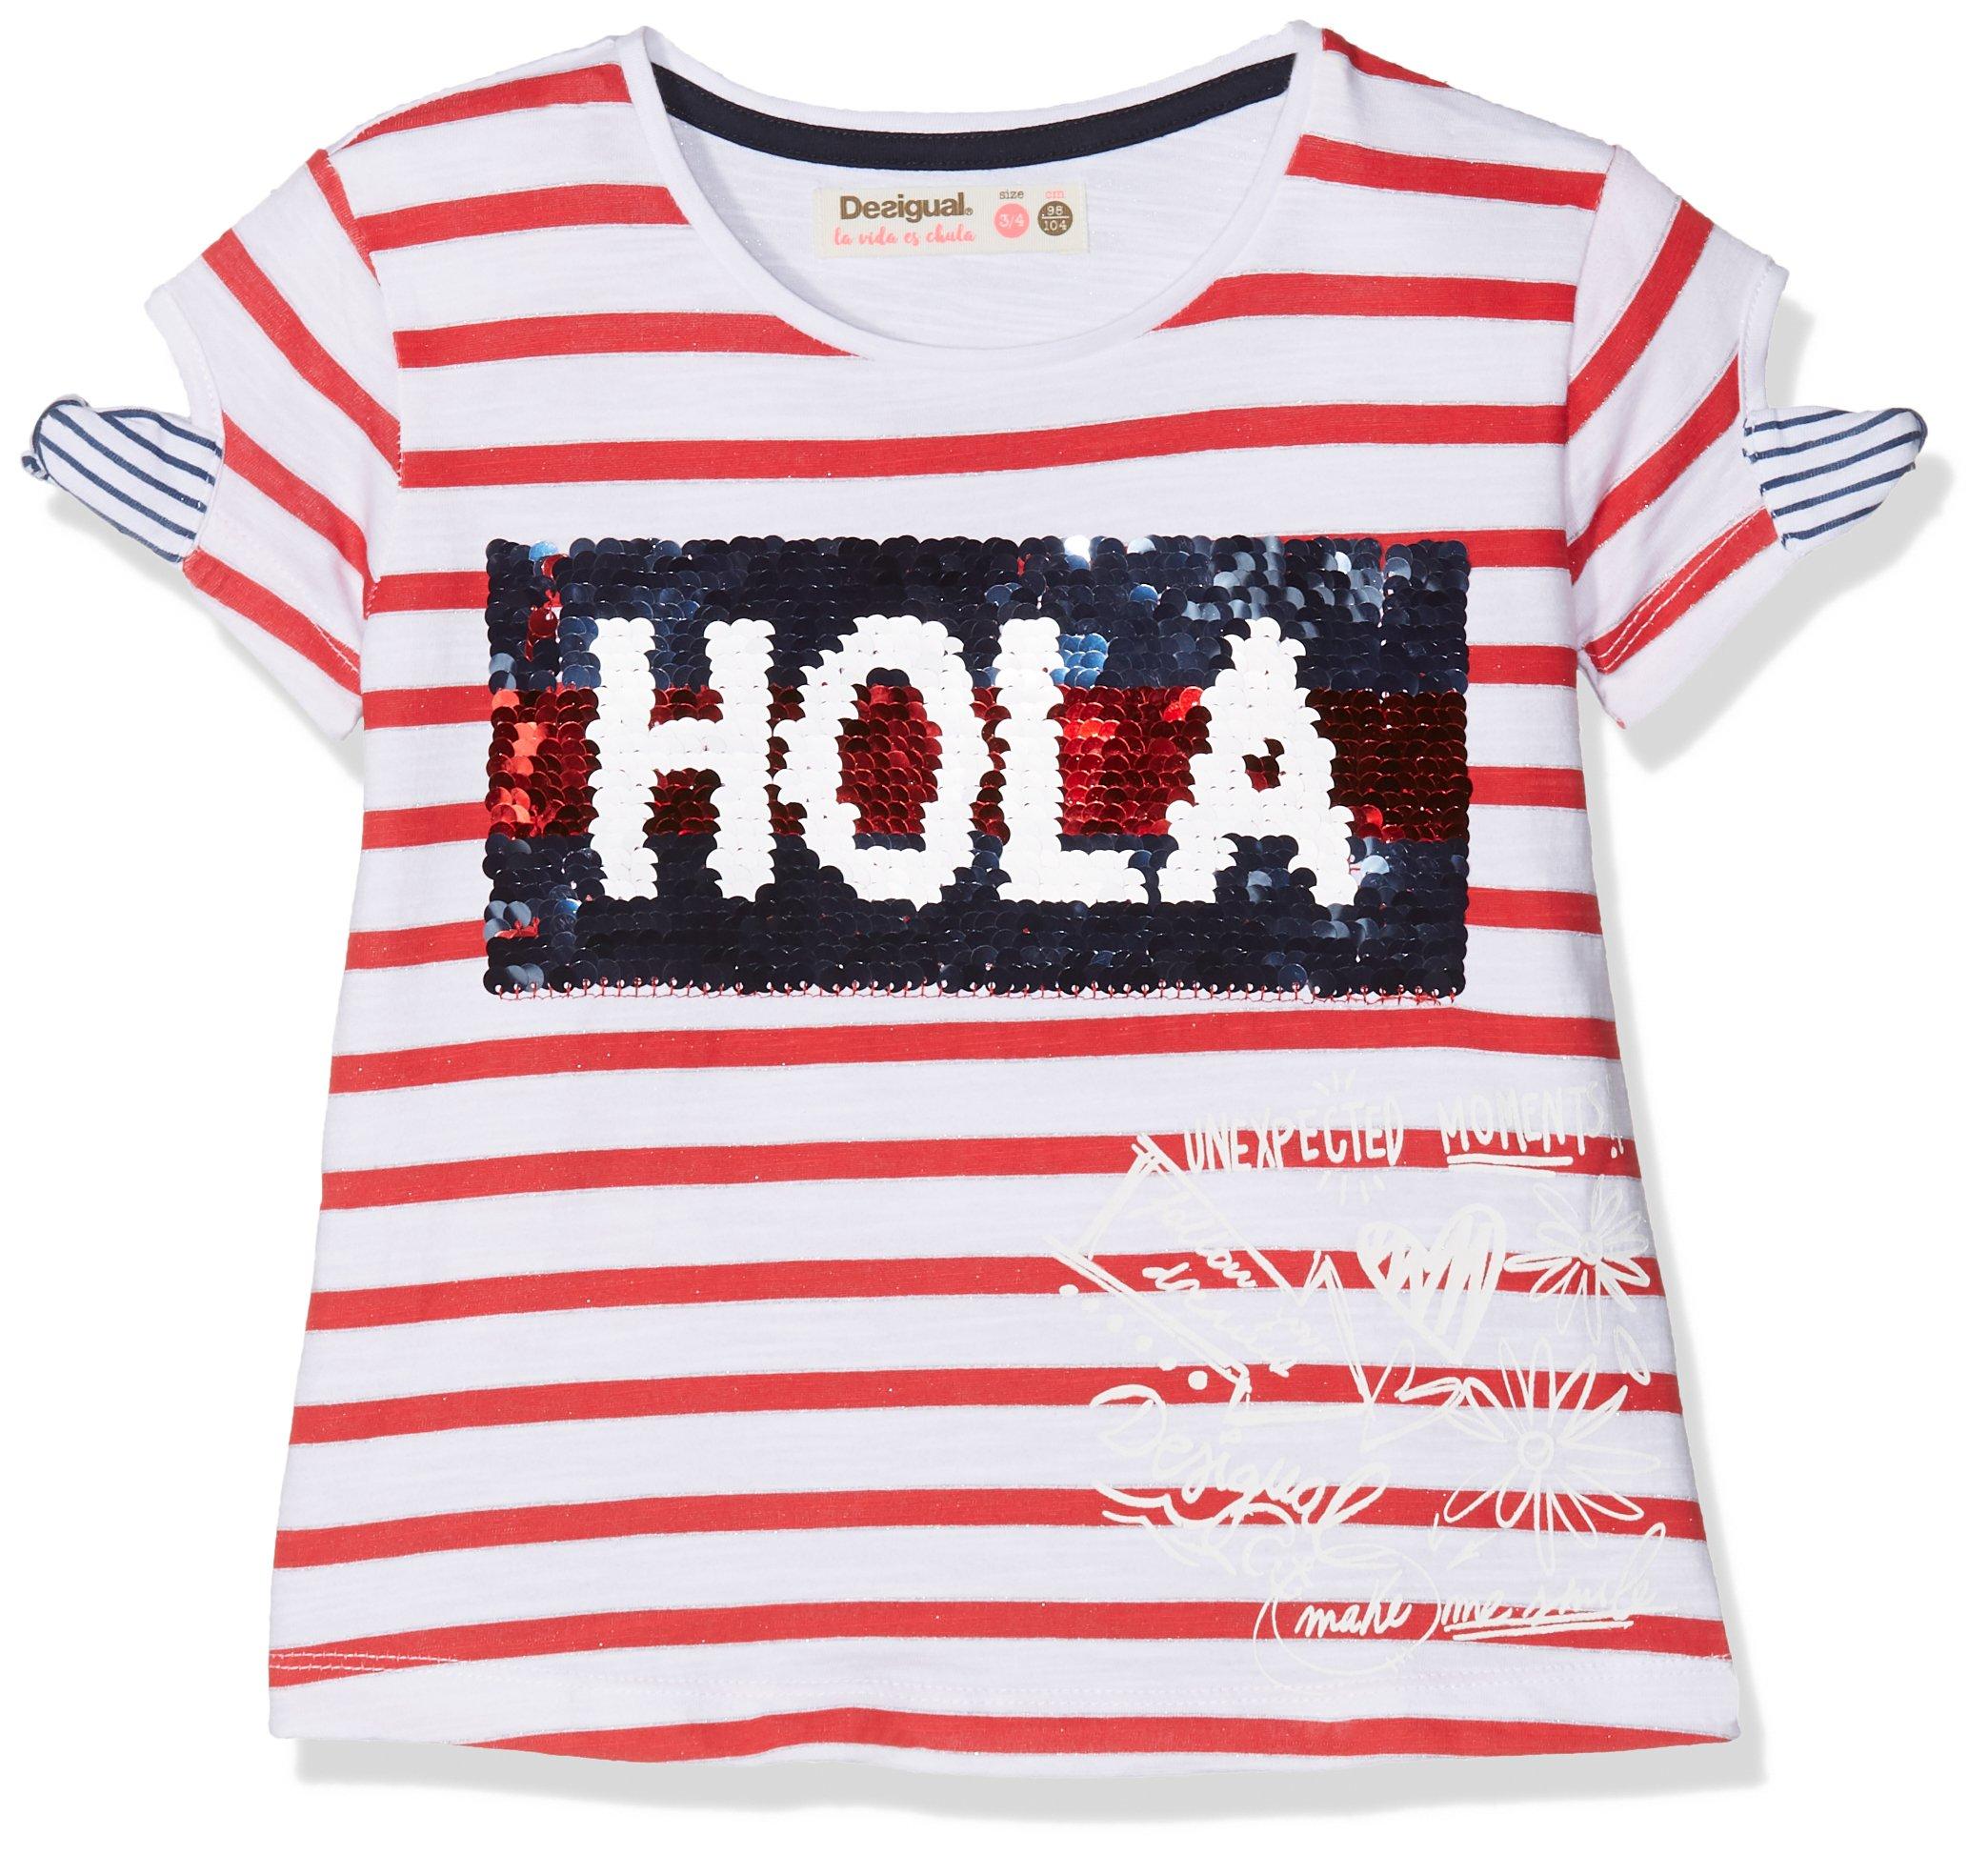 Desigual TS_Nashville Camiseta para Niñas